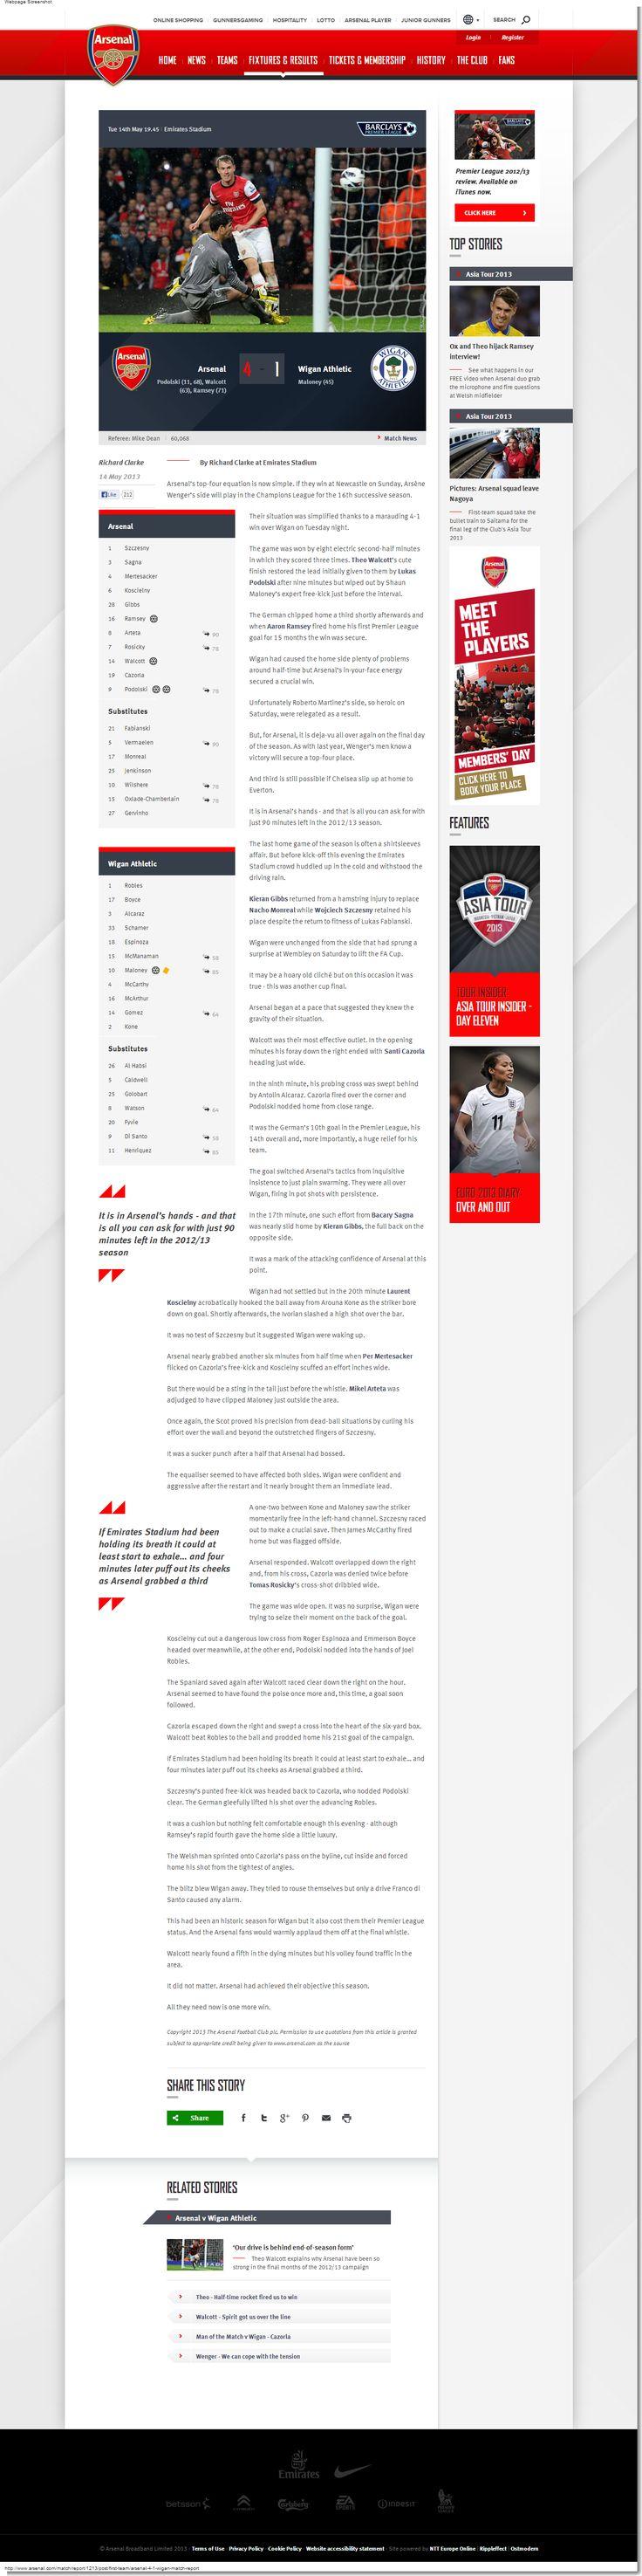 Arsenal club site - Match report